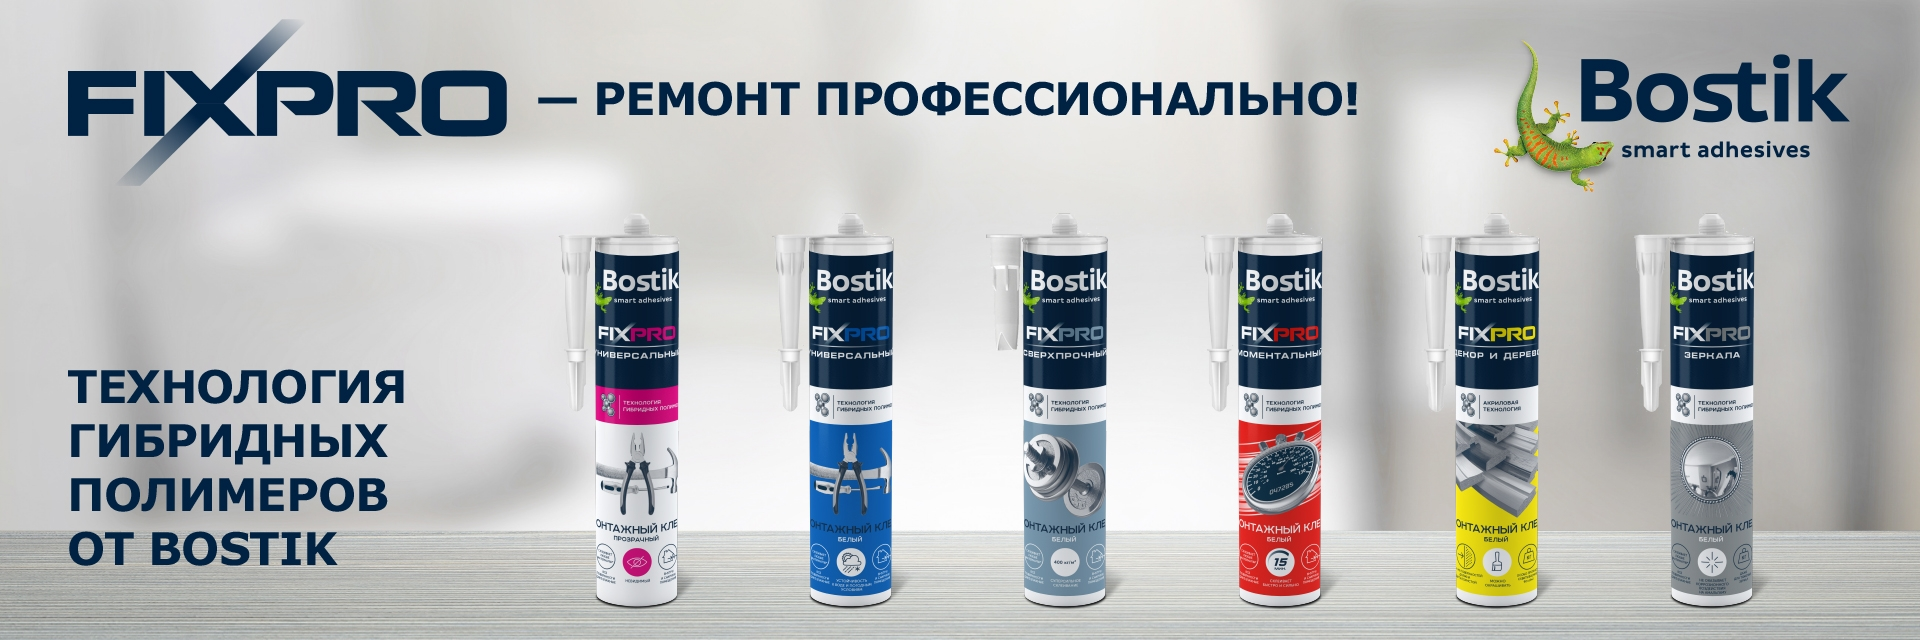 Bostik DIY Russia FIXPRO banner 1920-640